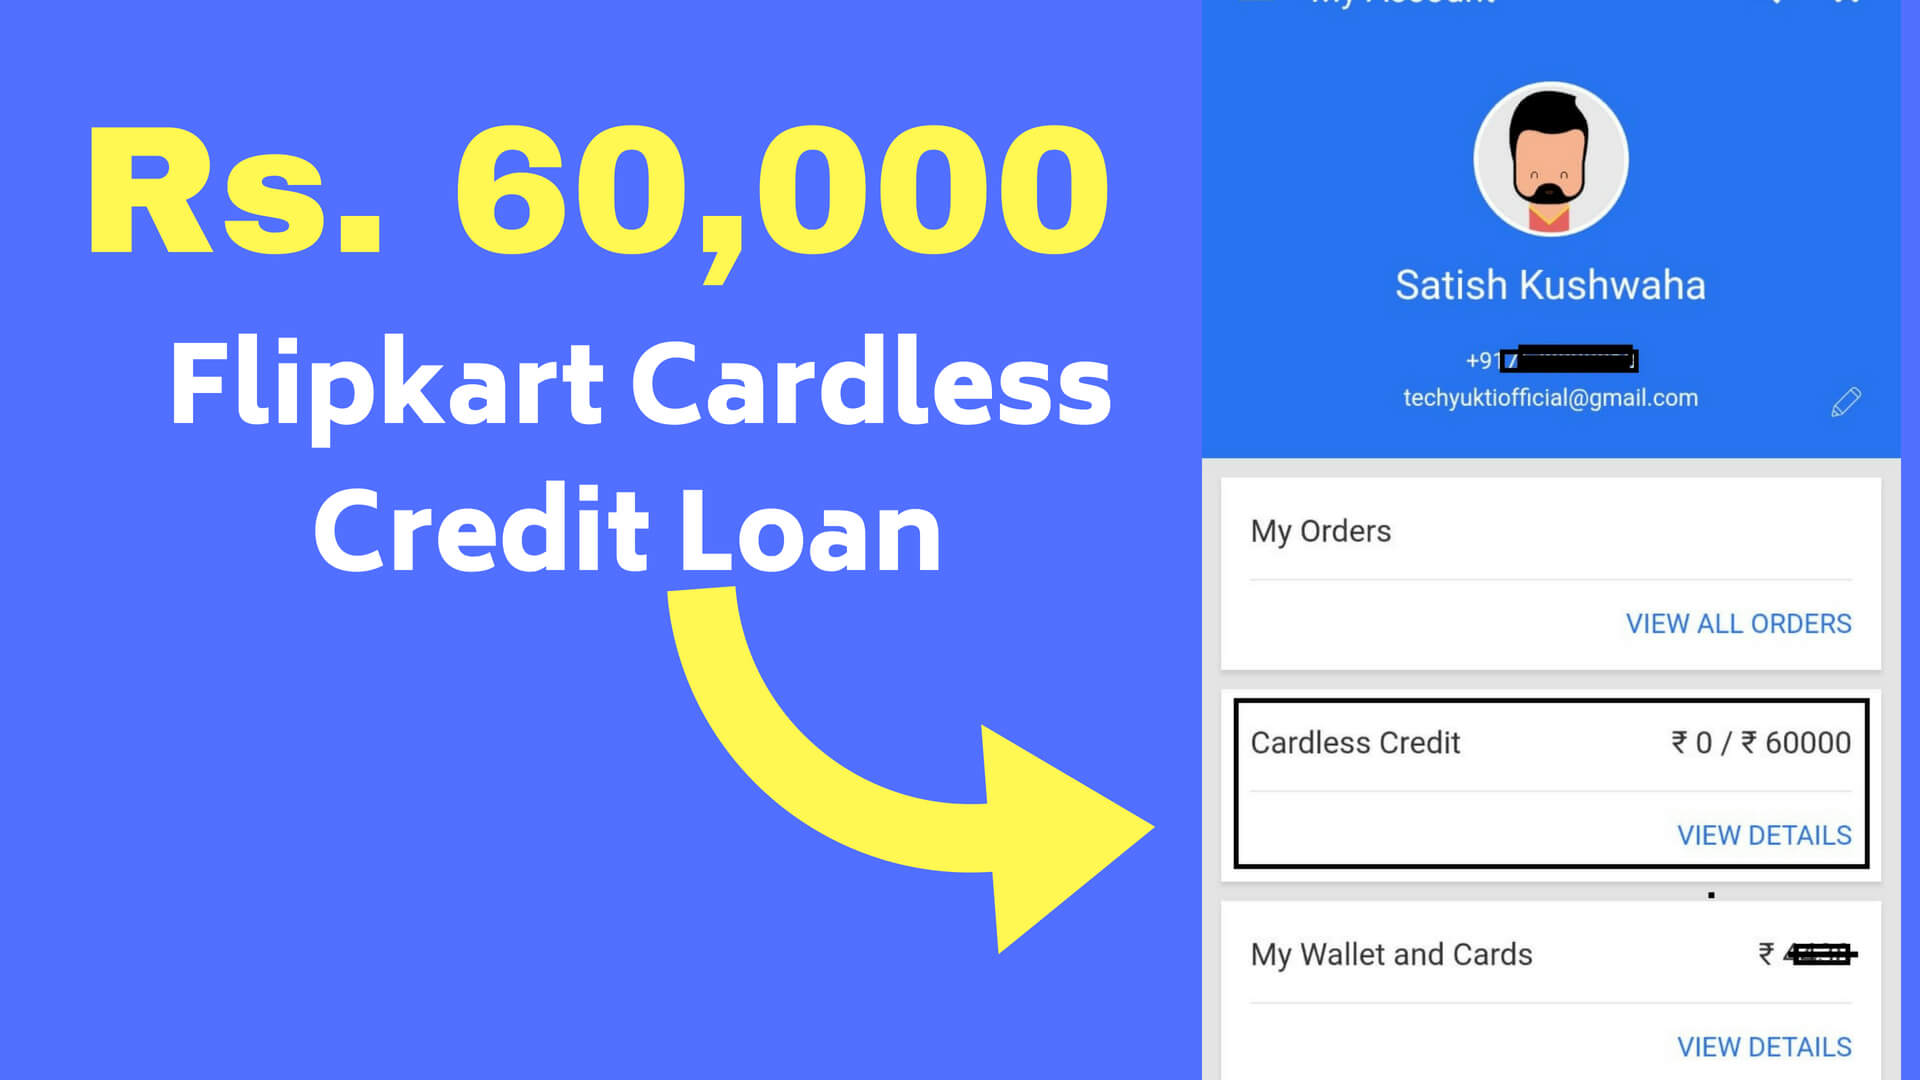 Flipkart Cardless Credit Loan